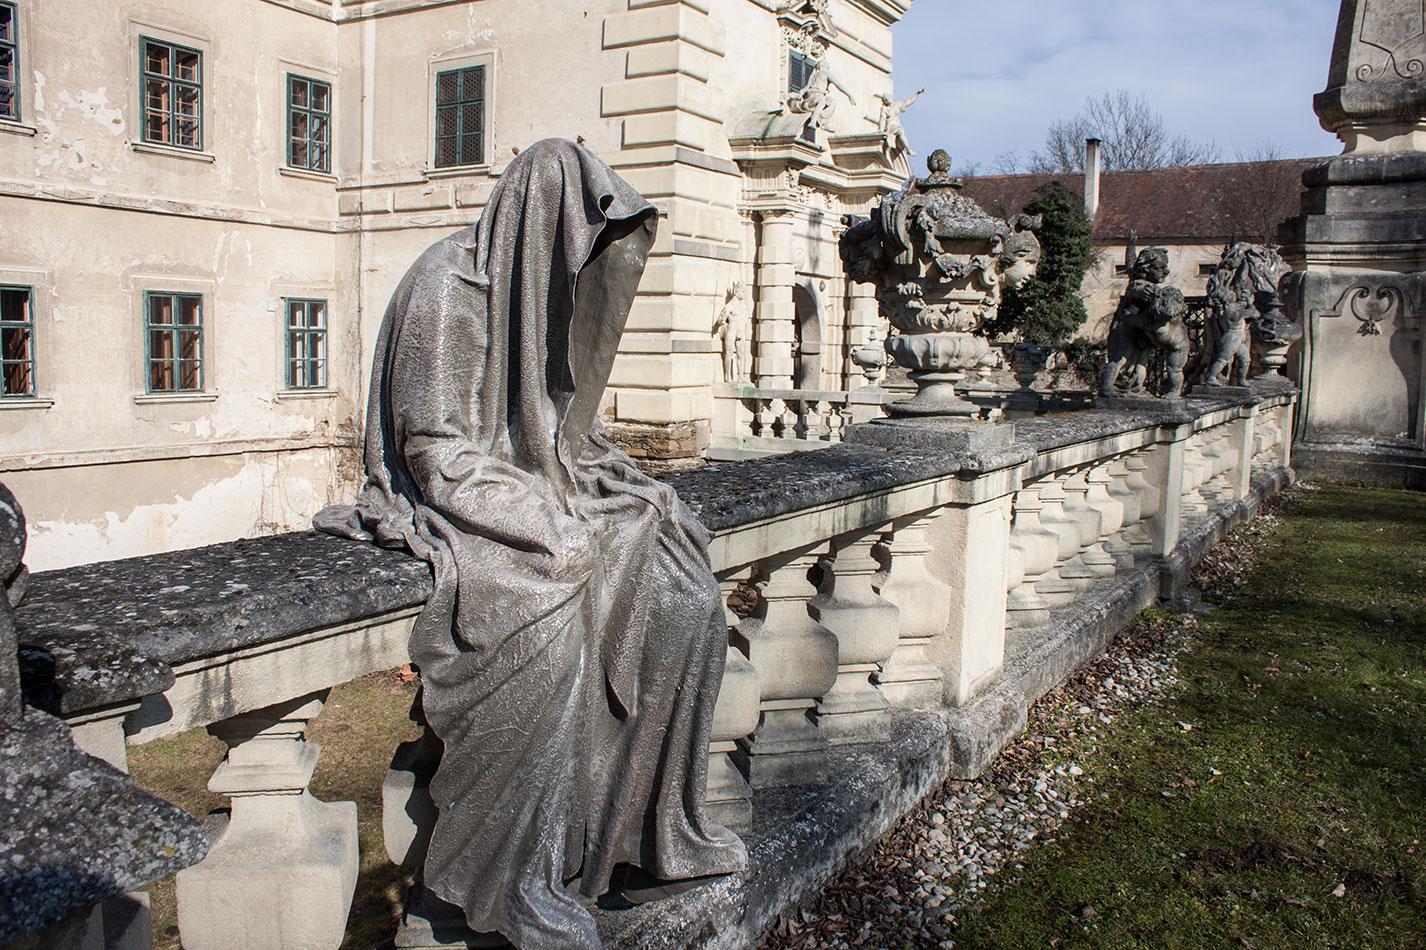 castle-greilenstein-lower-austria-wood-quater-waldviertel-guardians-of-time-contemporary-art-sculpture-design-antique-manfred-kielnhofer-7436